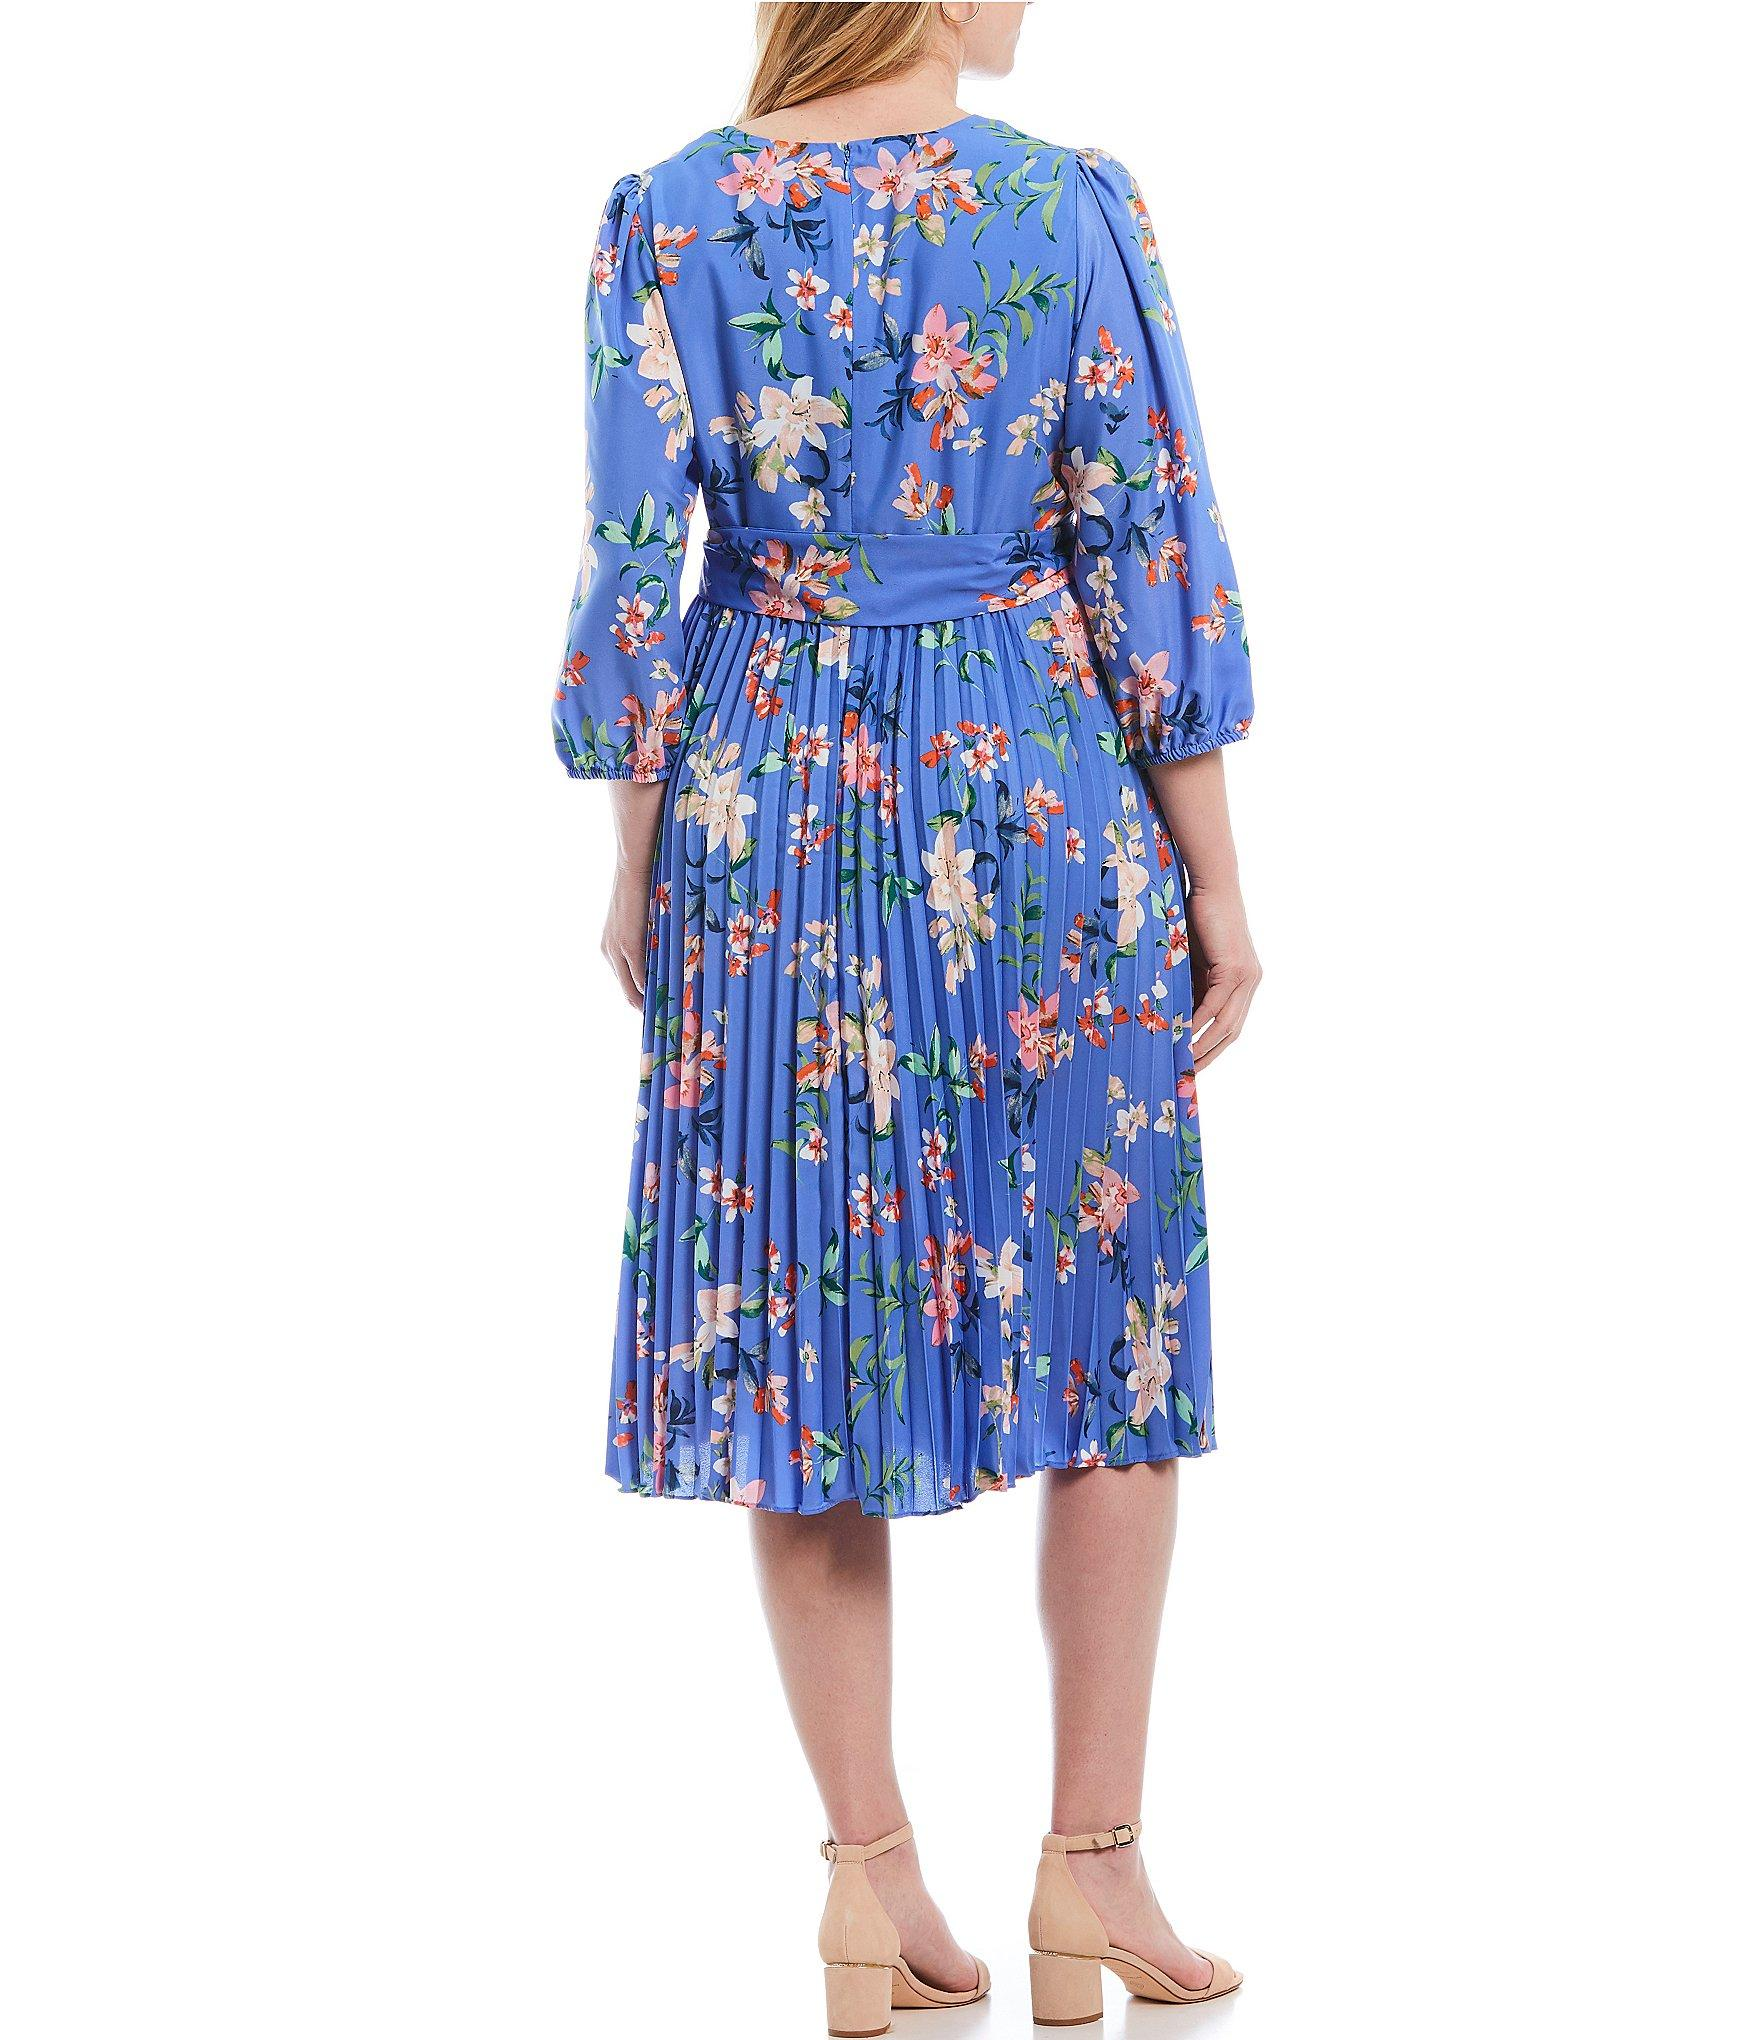 637edca5092 Lyst - Eliza J Plus Size Floral Print V-neck Pleated Skirt 3/4 ...